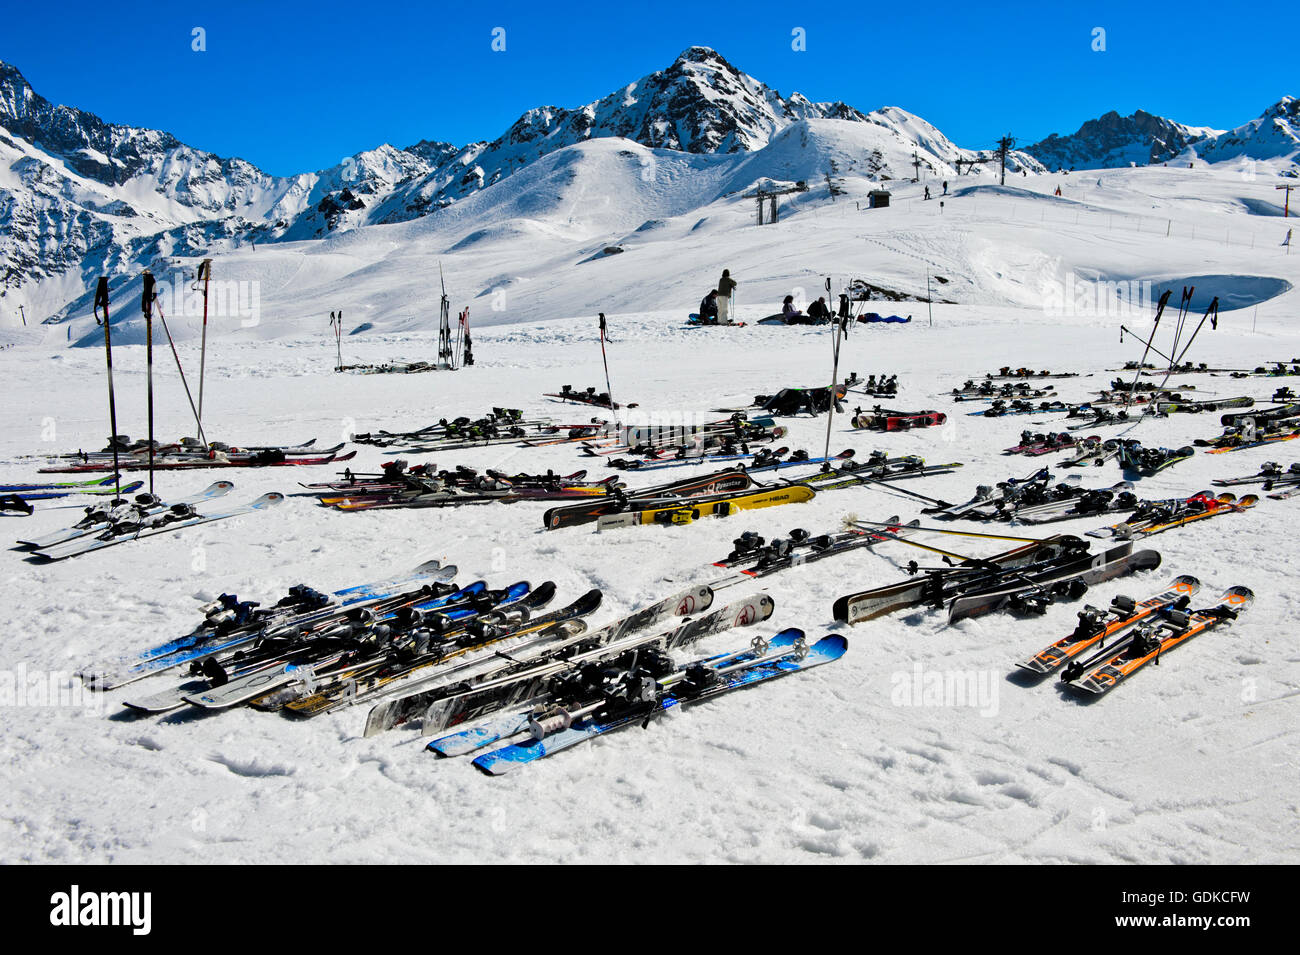 Pairs of skis lying on snow, Col du Joly, Les Contamines-Montjoie ski resort, Haute-Savoie, France - Stock Image